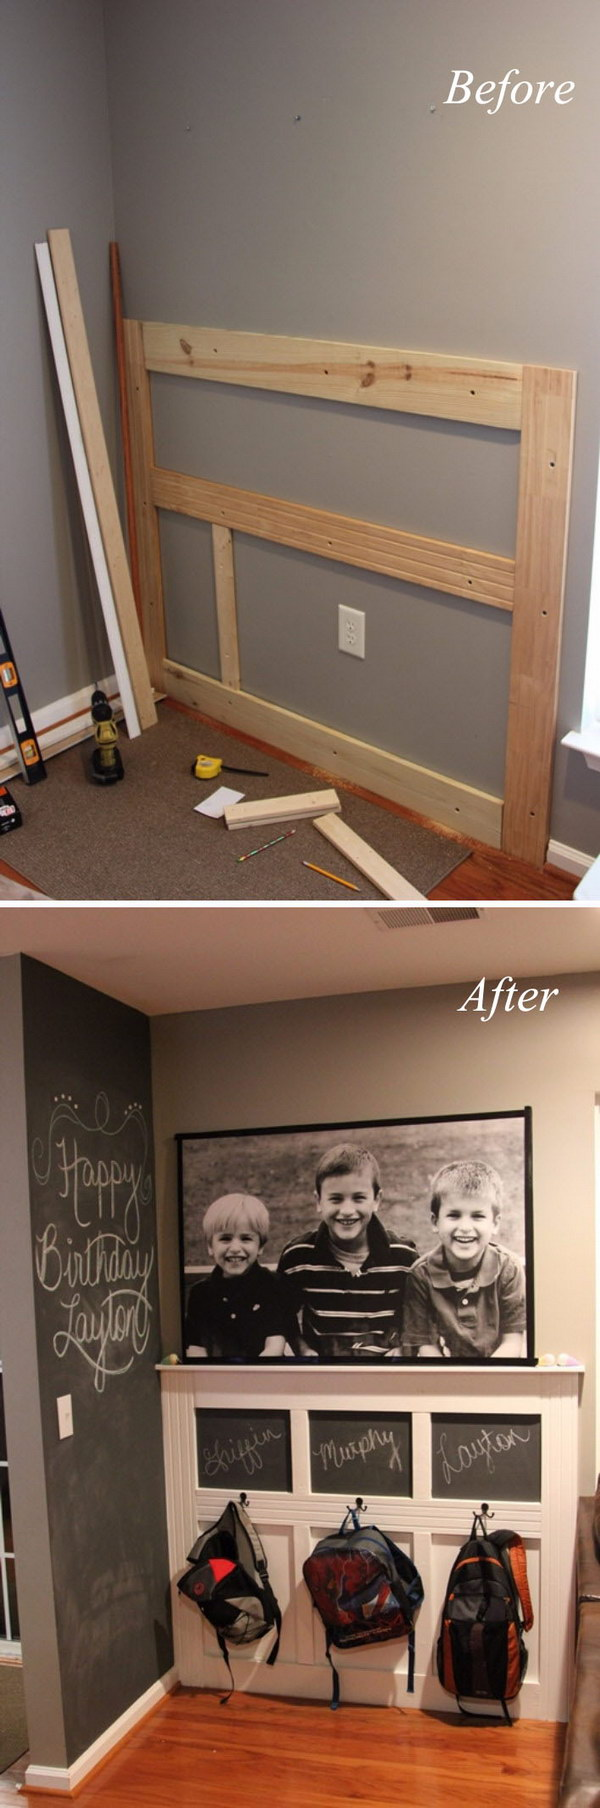 3 entryway makeover diy ideas tutorials - 30+ DIY Ideas to Give a Makeover to a Your Entryway